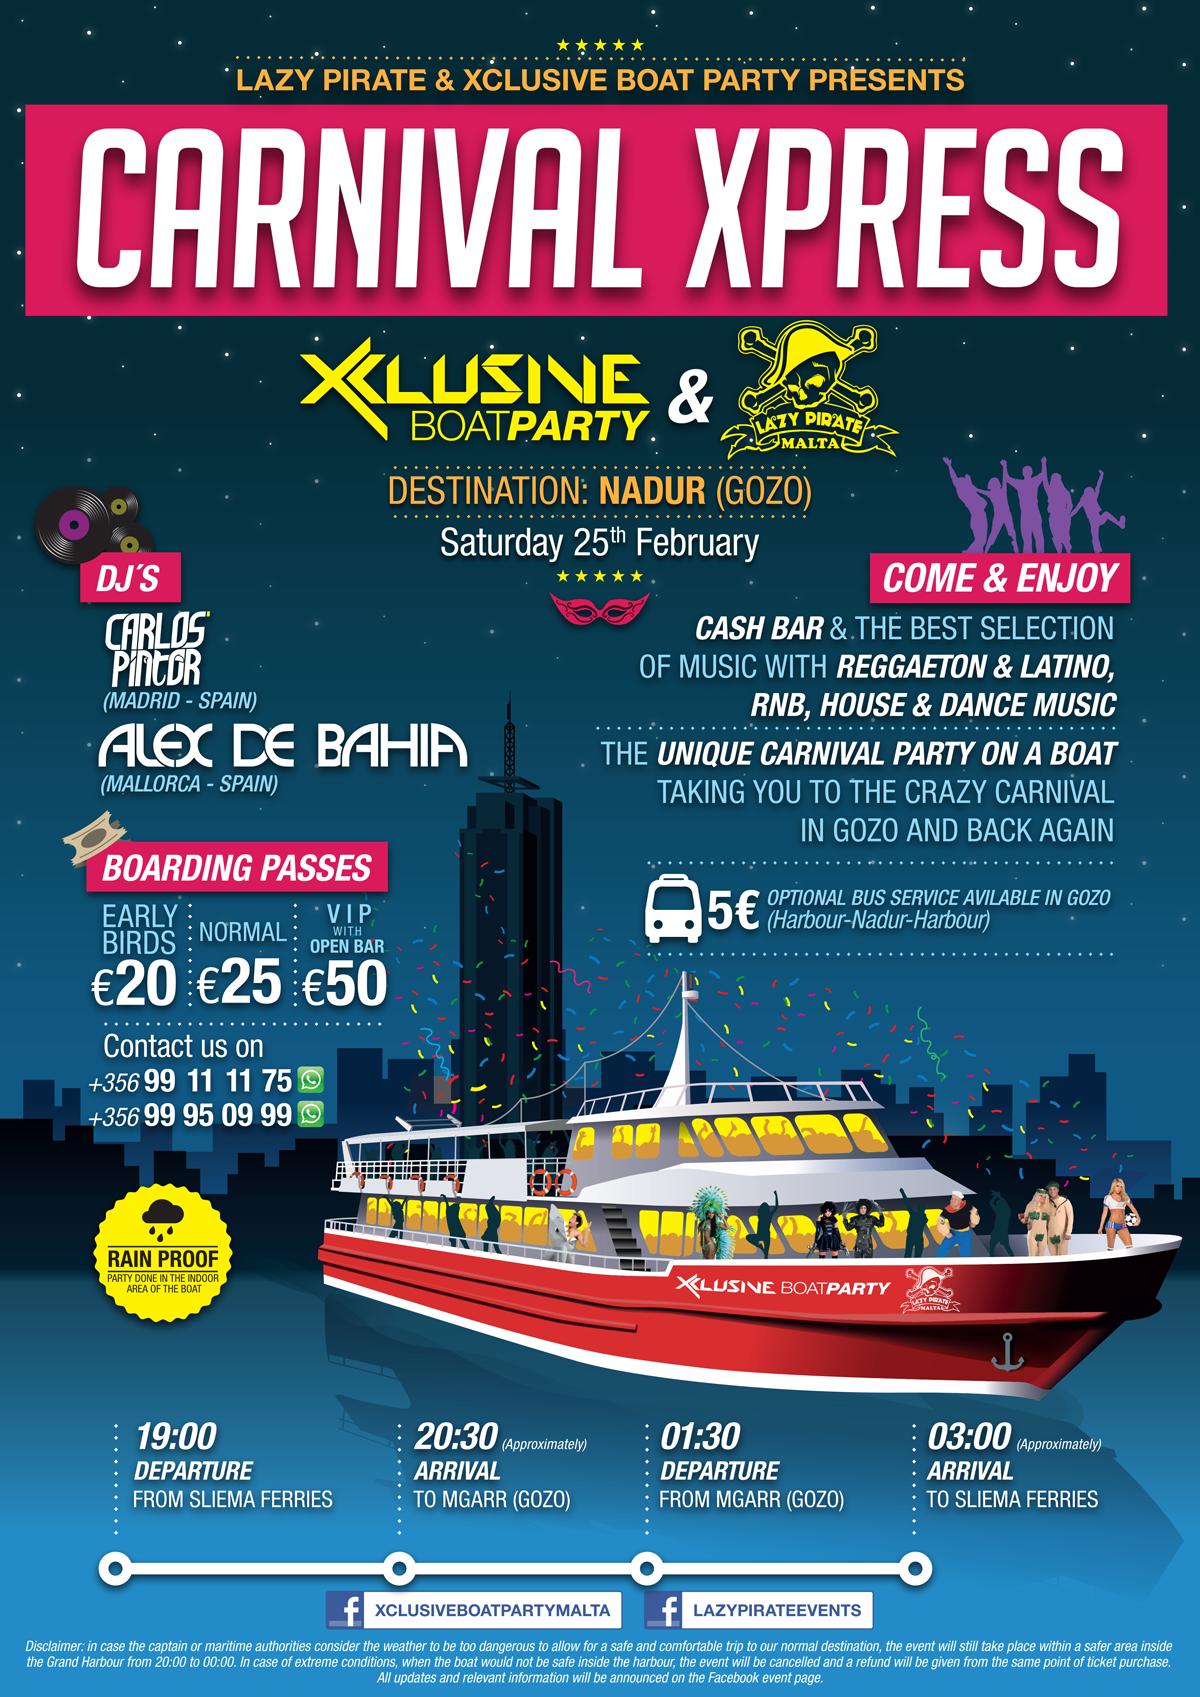 Carnival Xpress 2017 flyer